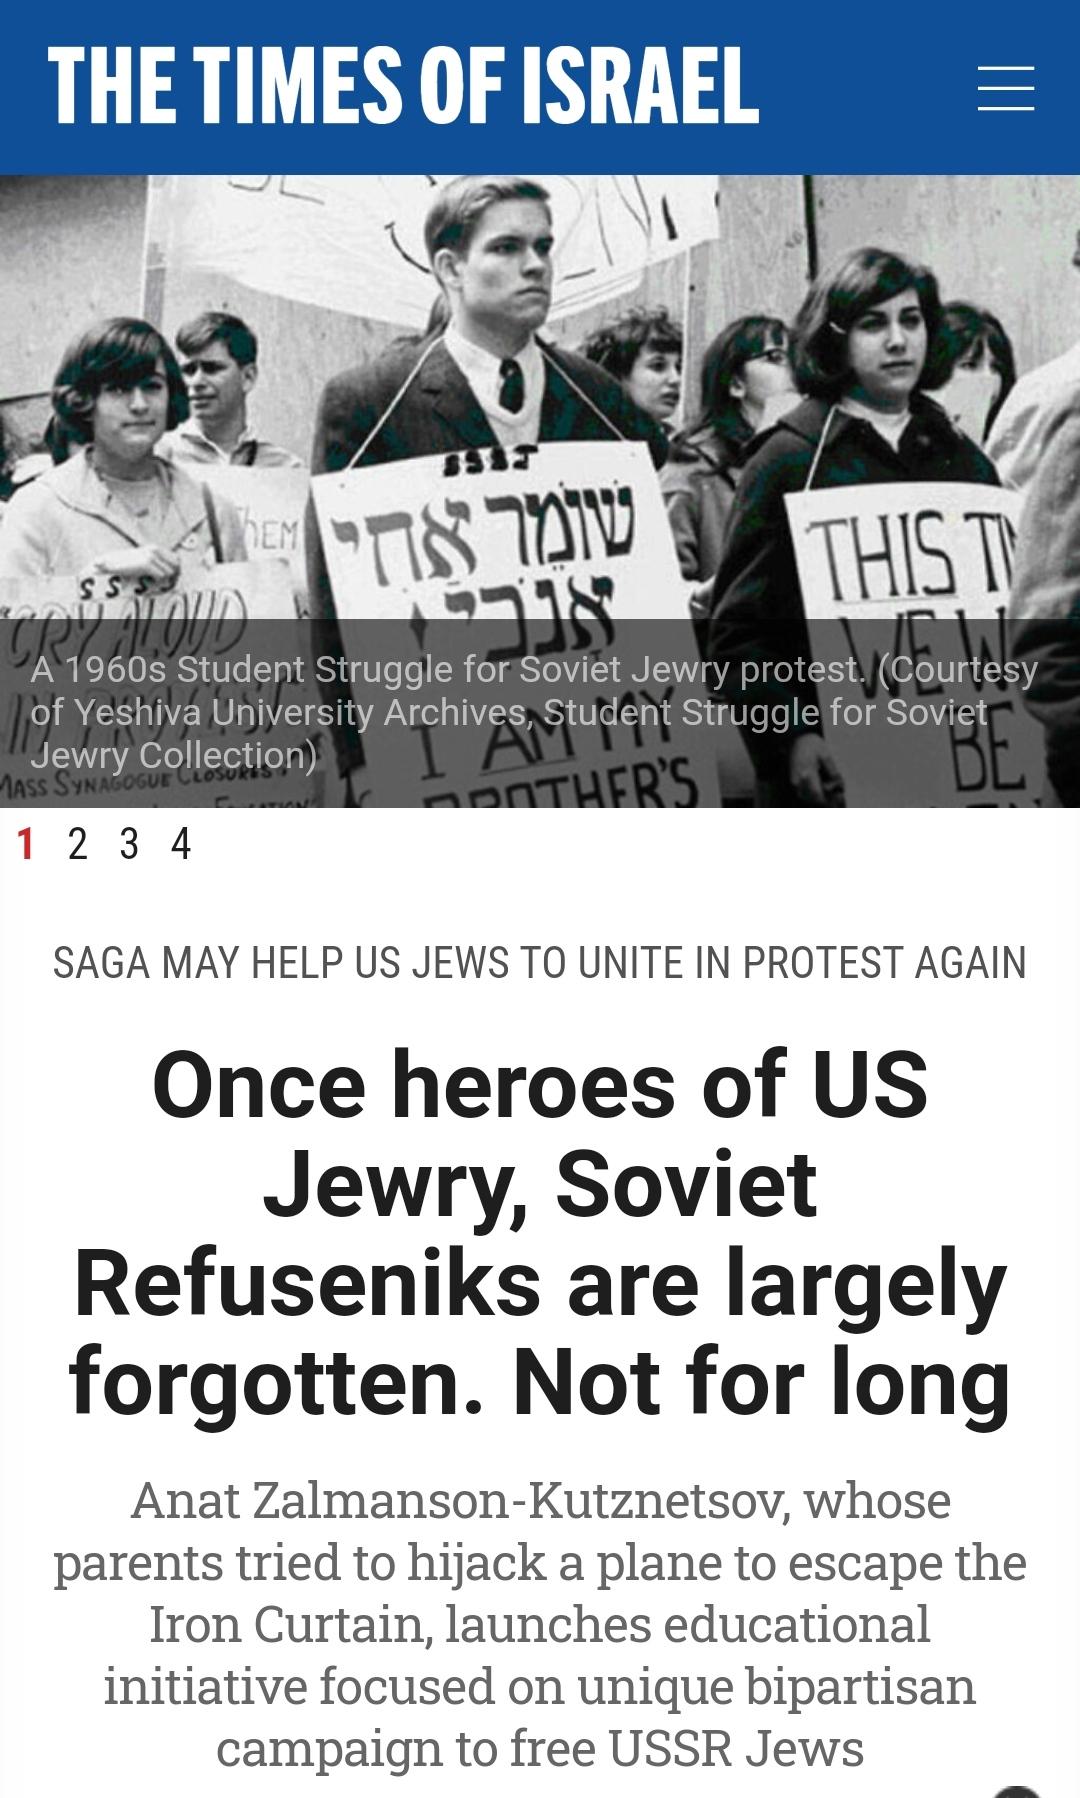 Once heroes of US Jewry, Soviet Refu